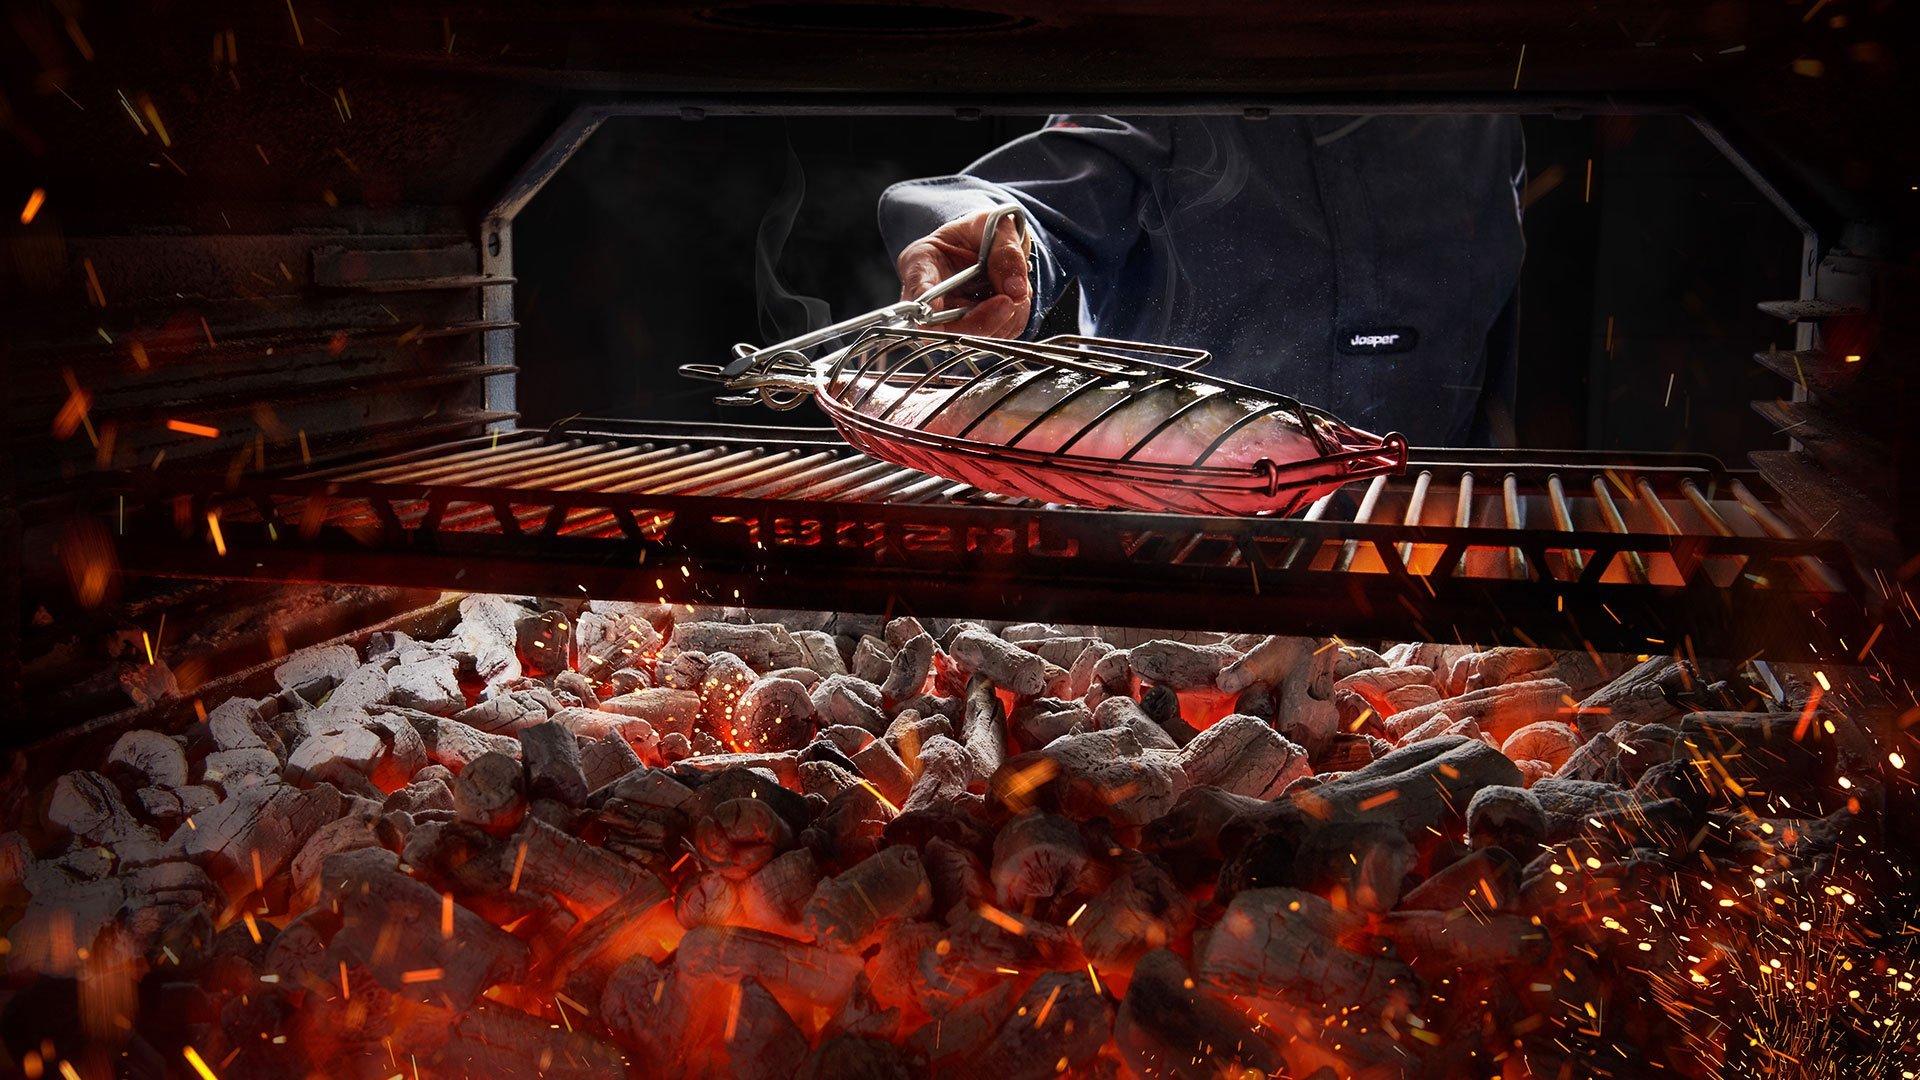 Josper Charcoal Ovens Passion For Grilling Josper